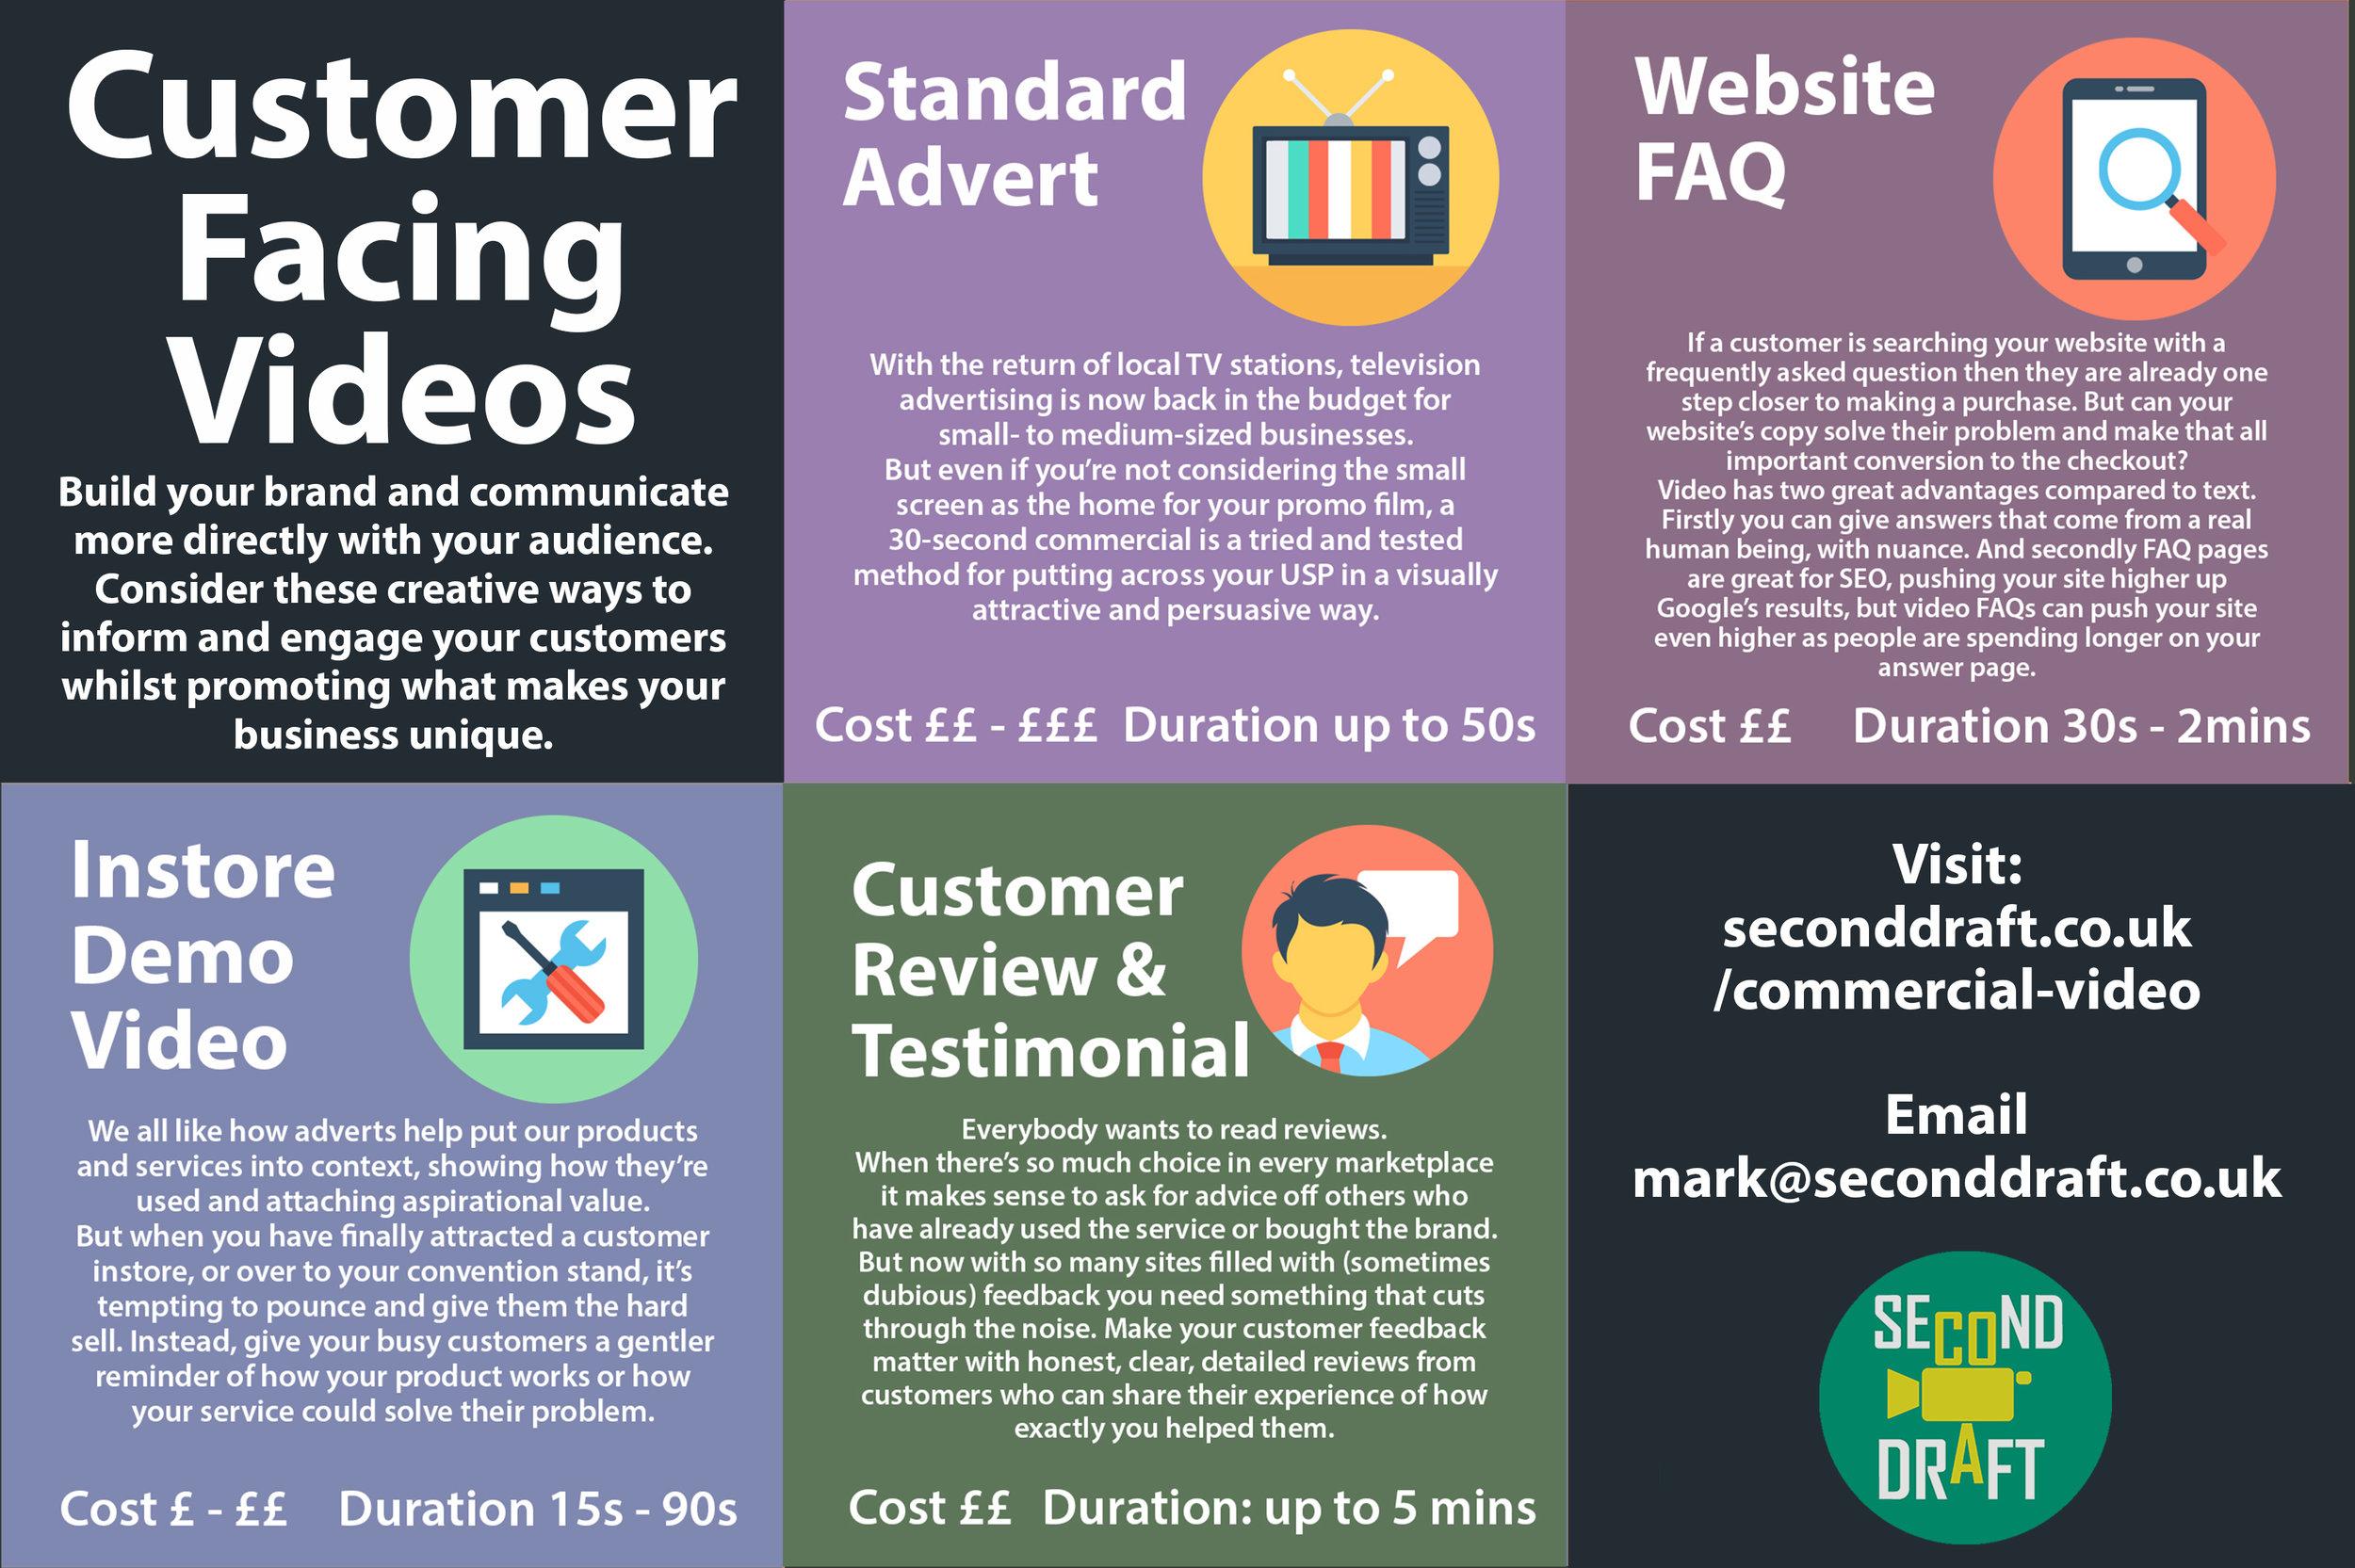 Customer facing pdf 2.jpg